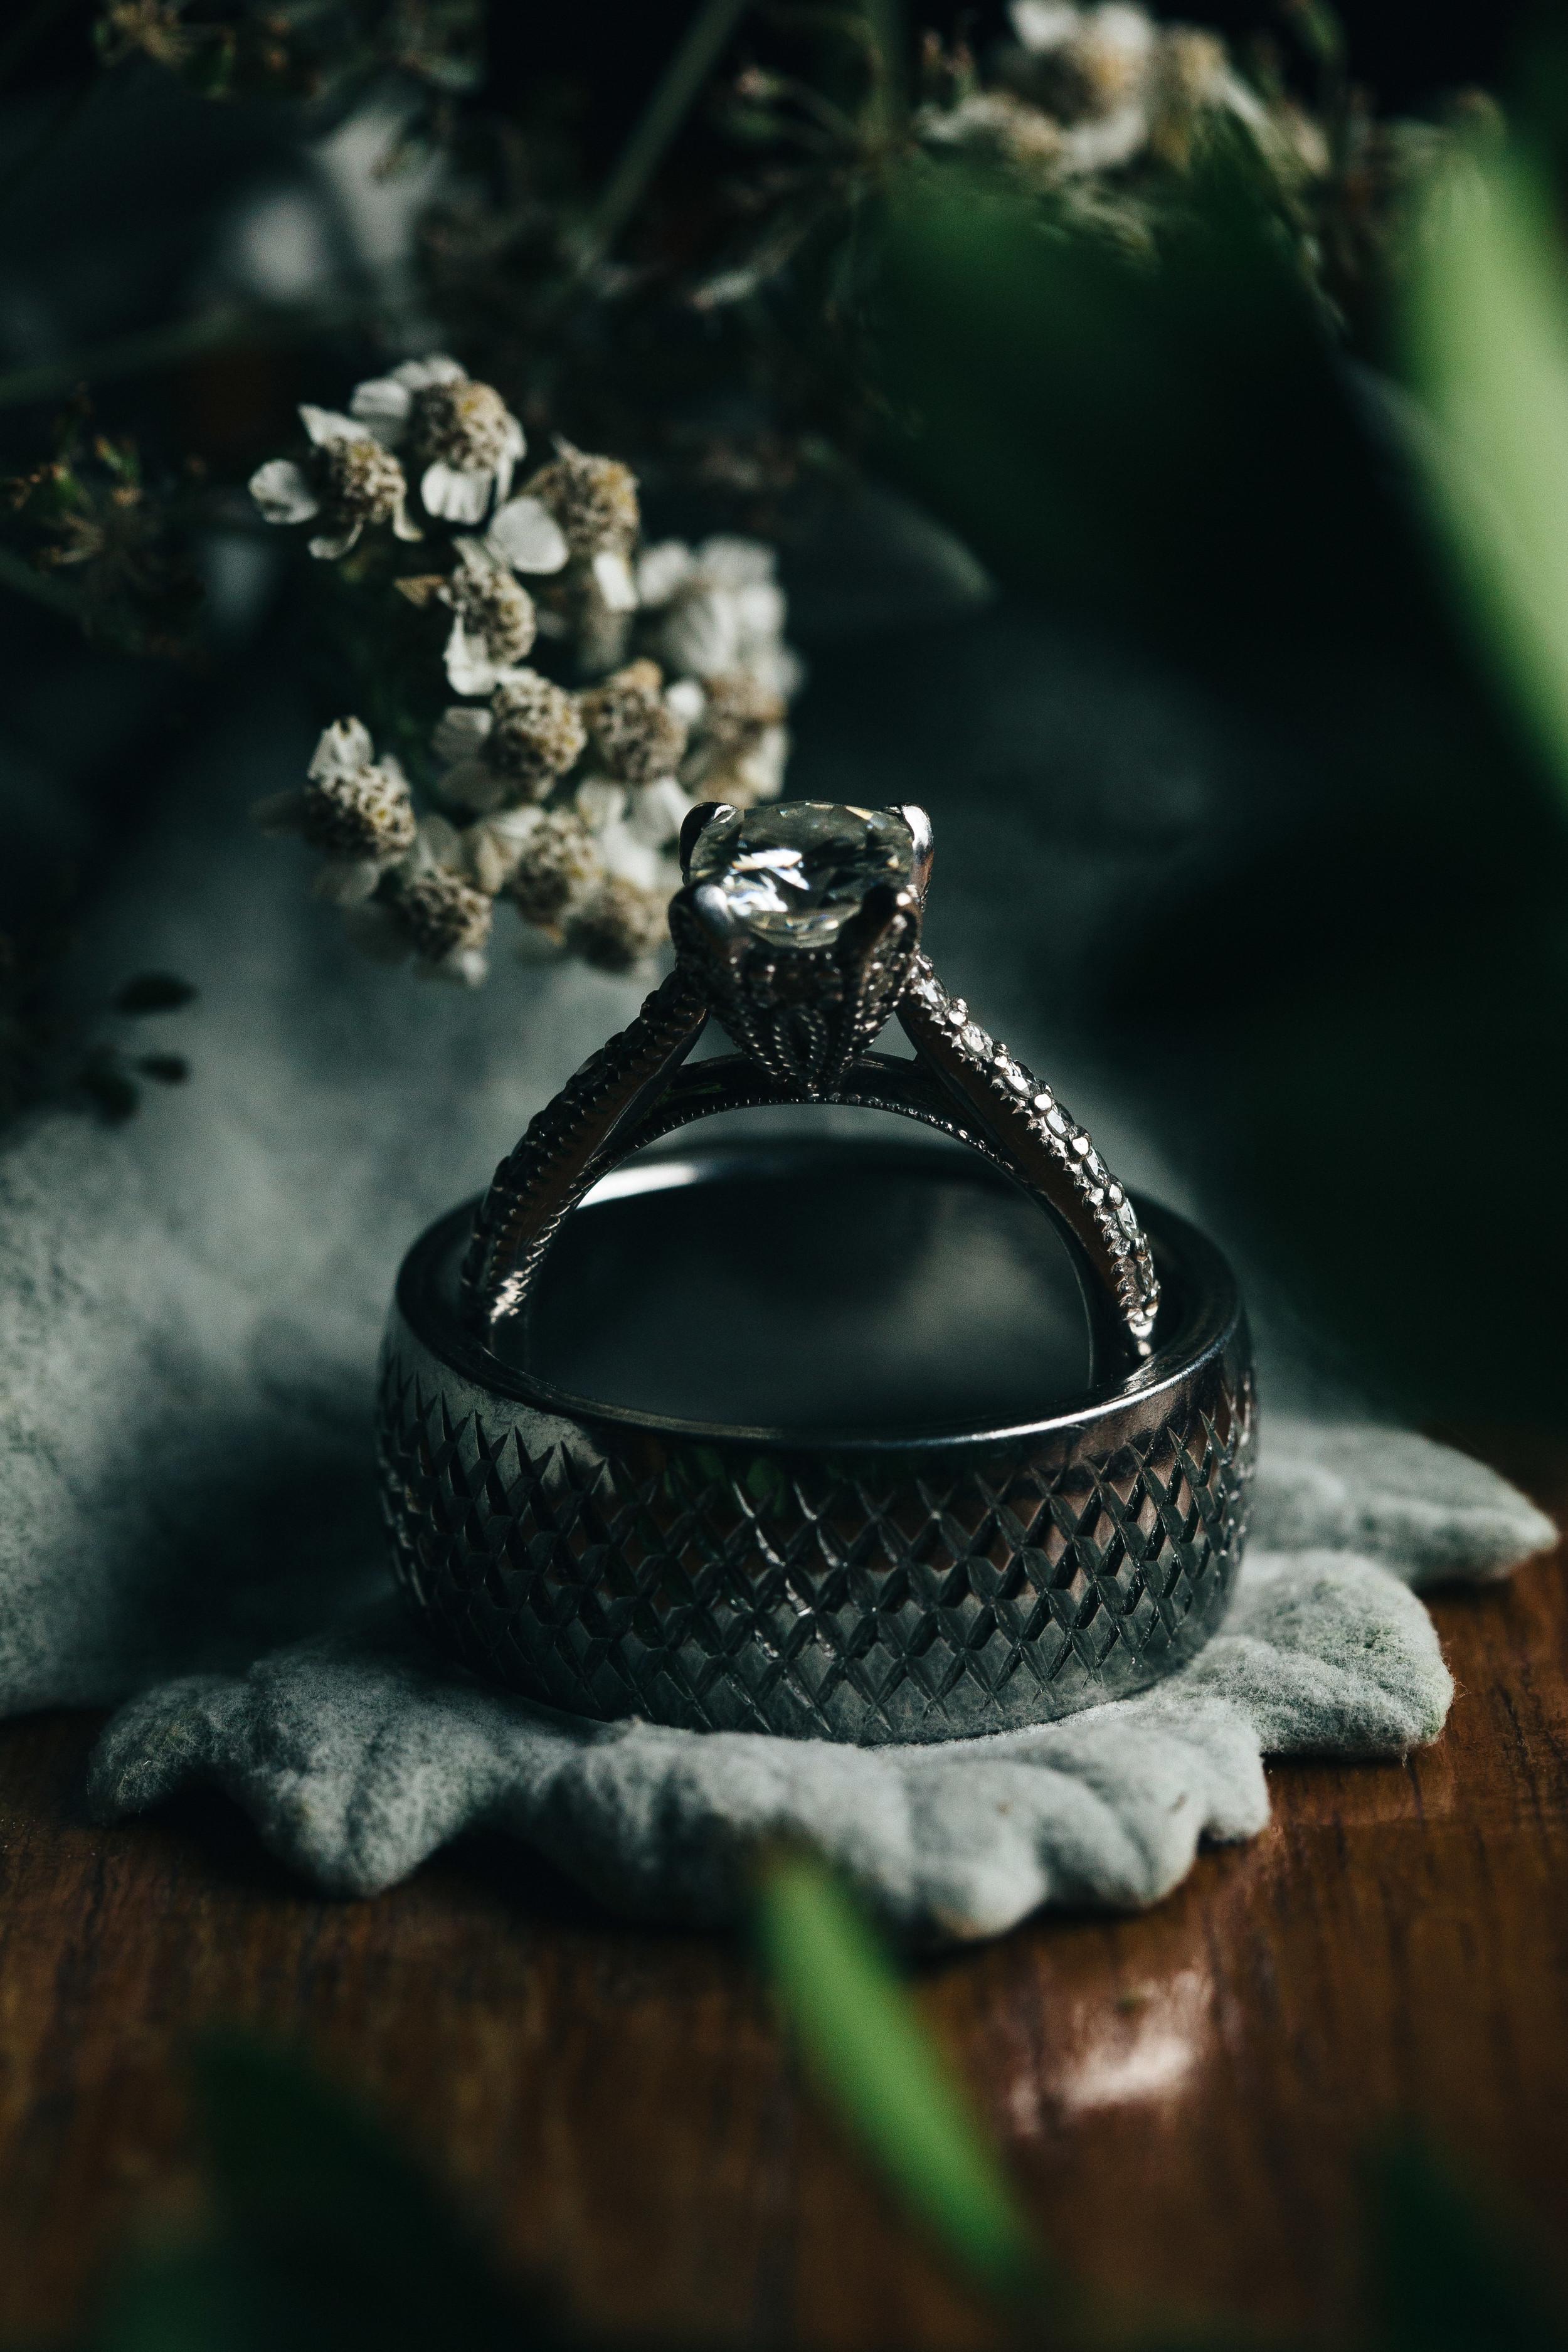 Mens wedding band and women's diamond wedding ring.